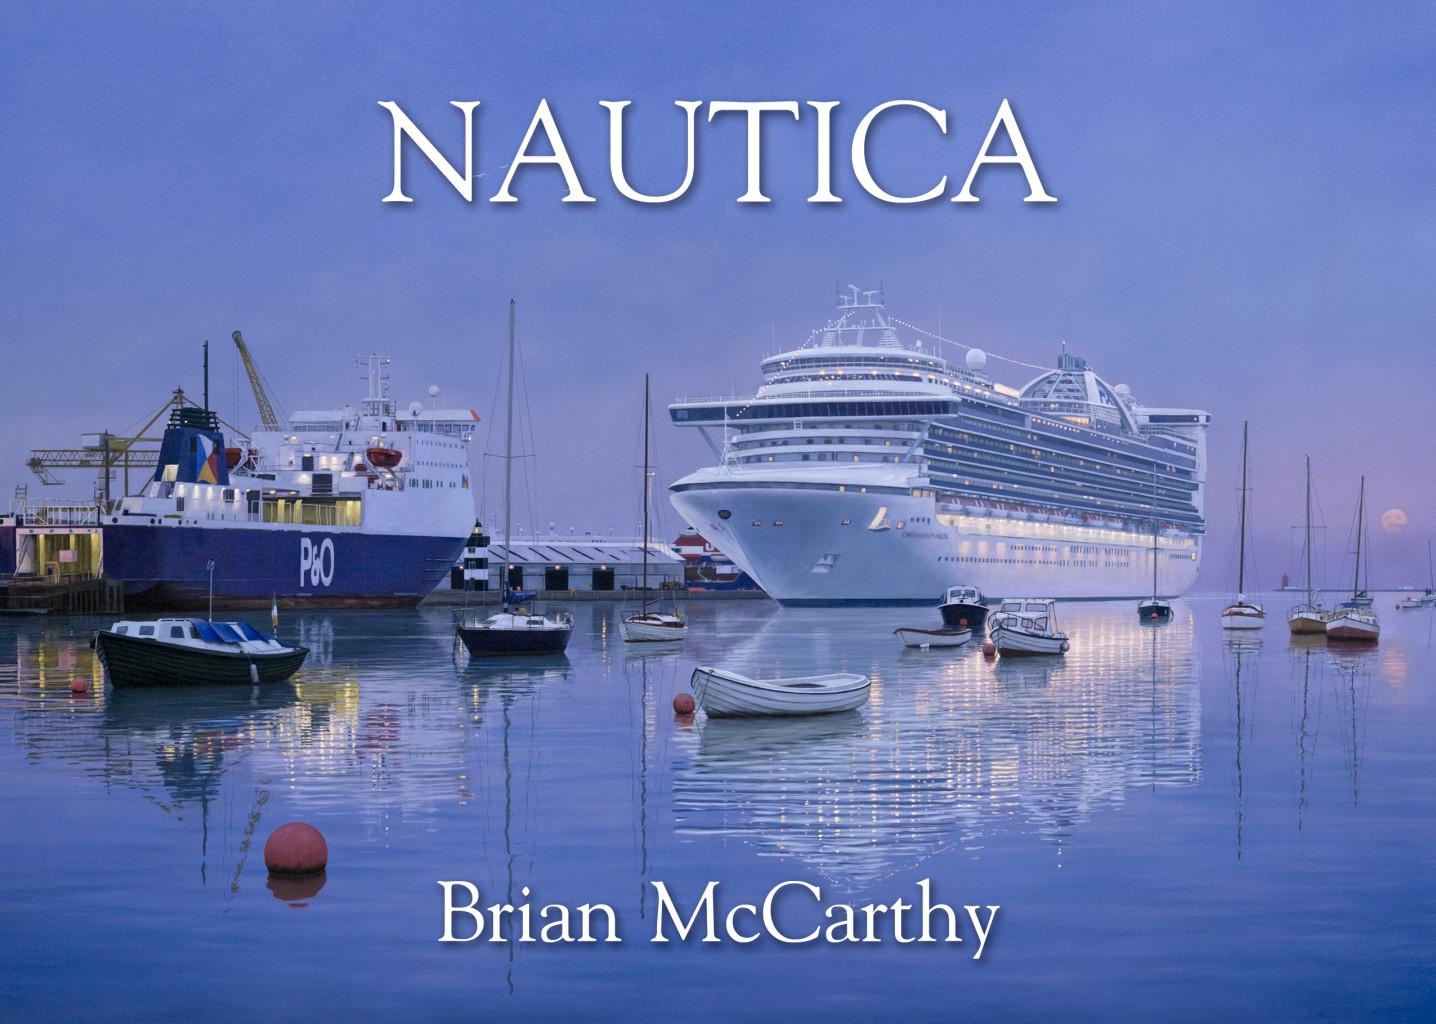 Nautica | Brian McCarthy at Mayo Contemporary Art Gallery